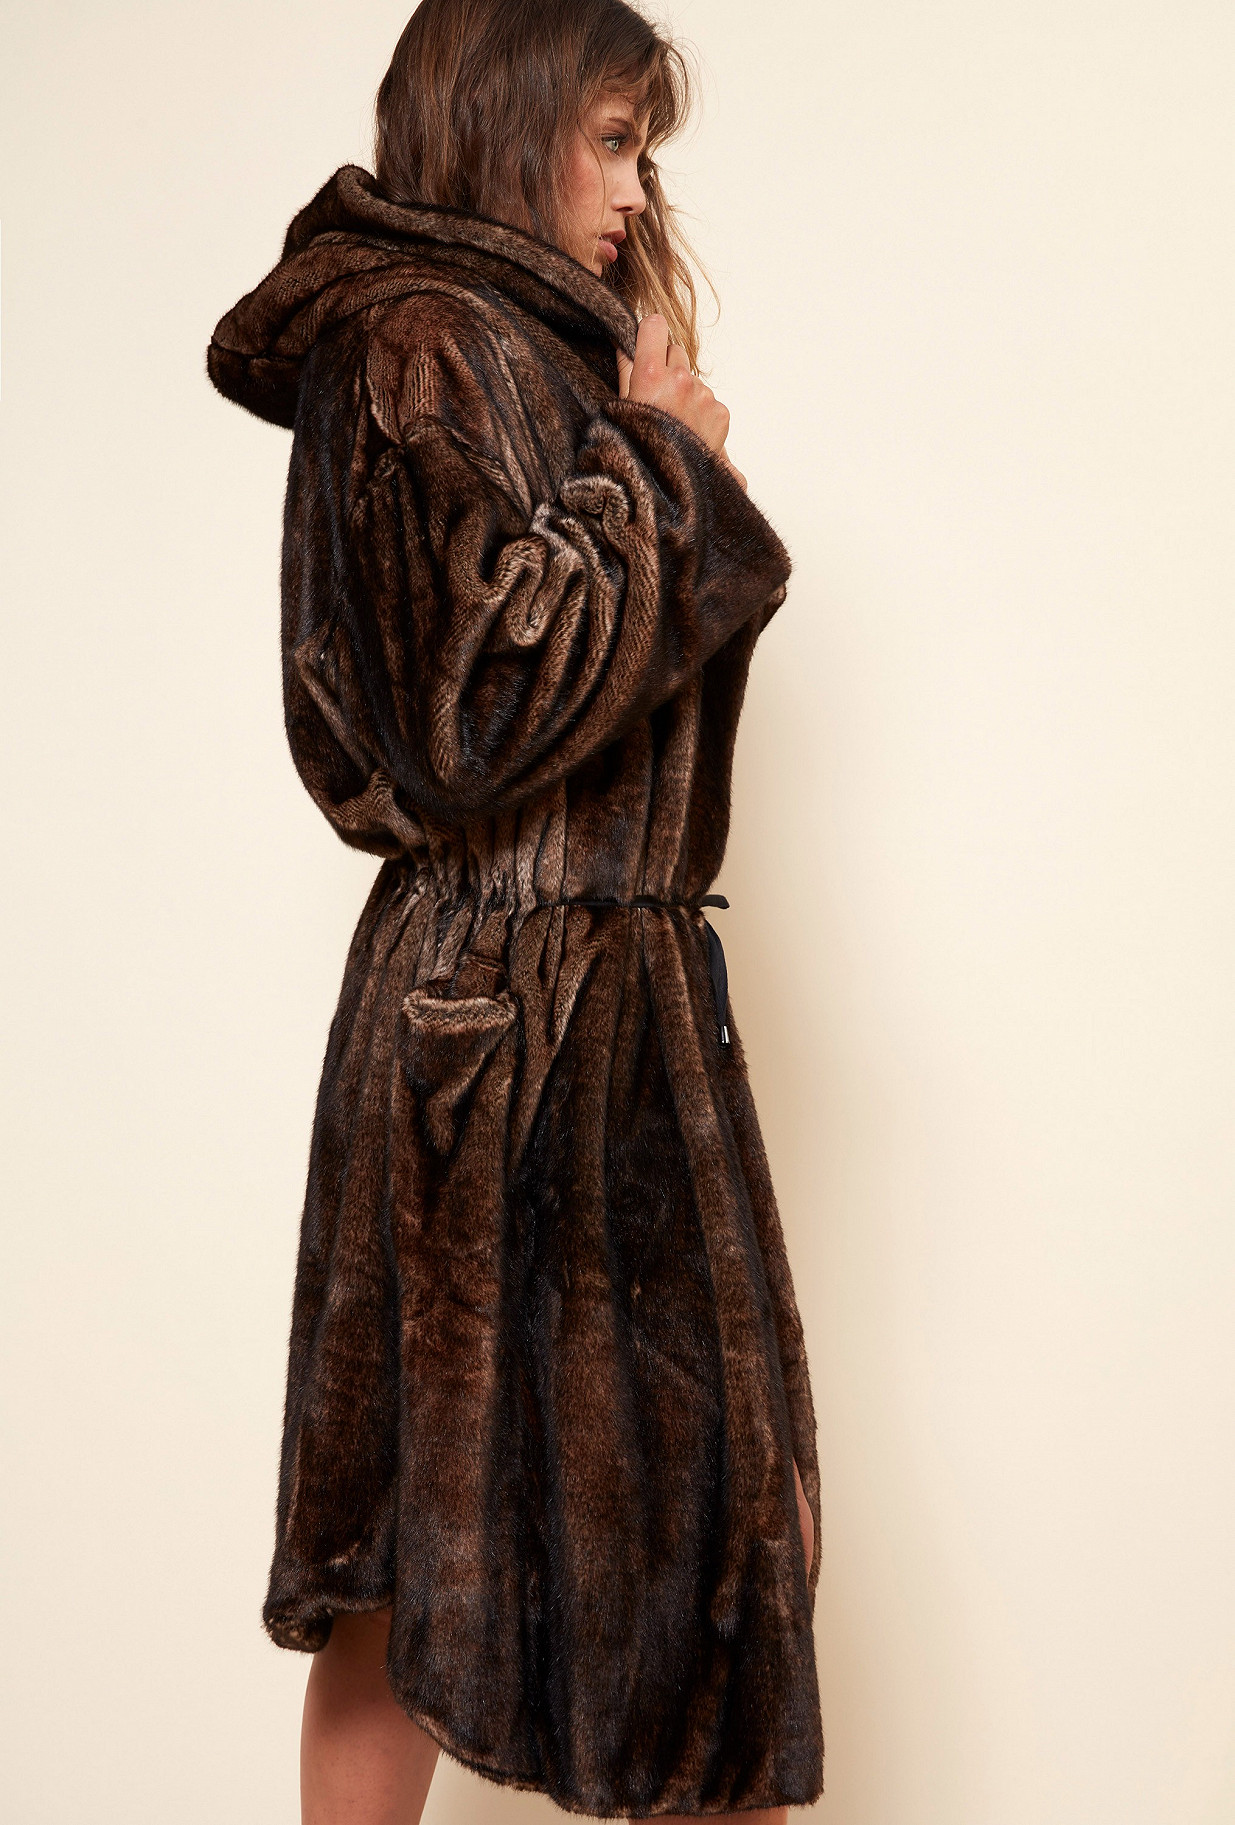 Brown COAT Mahogany